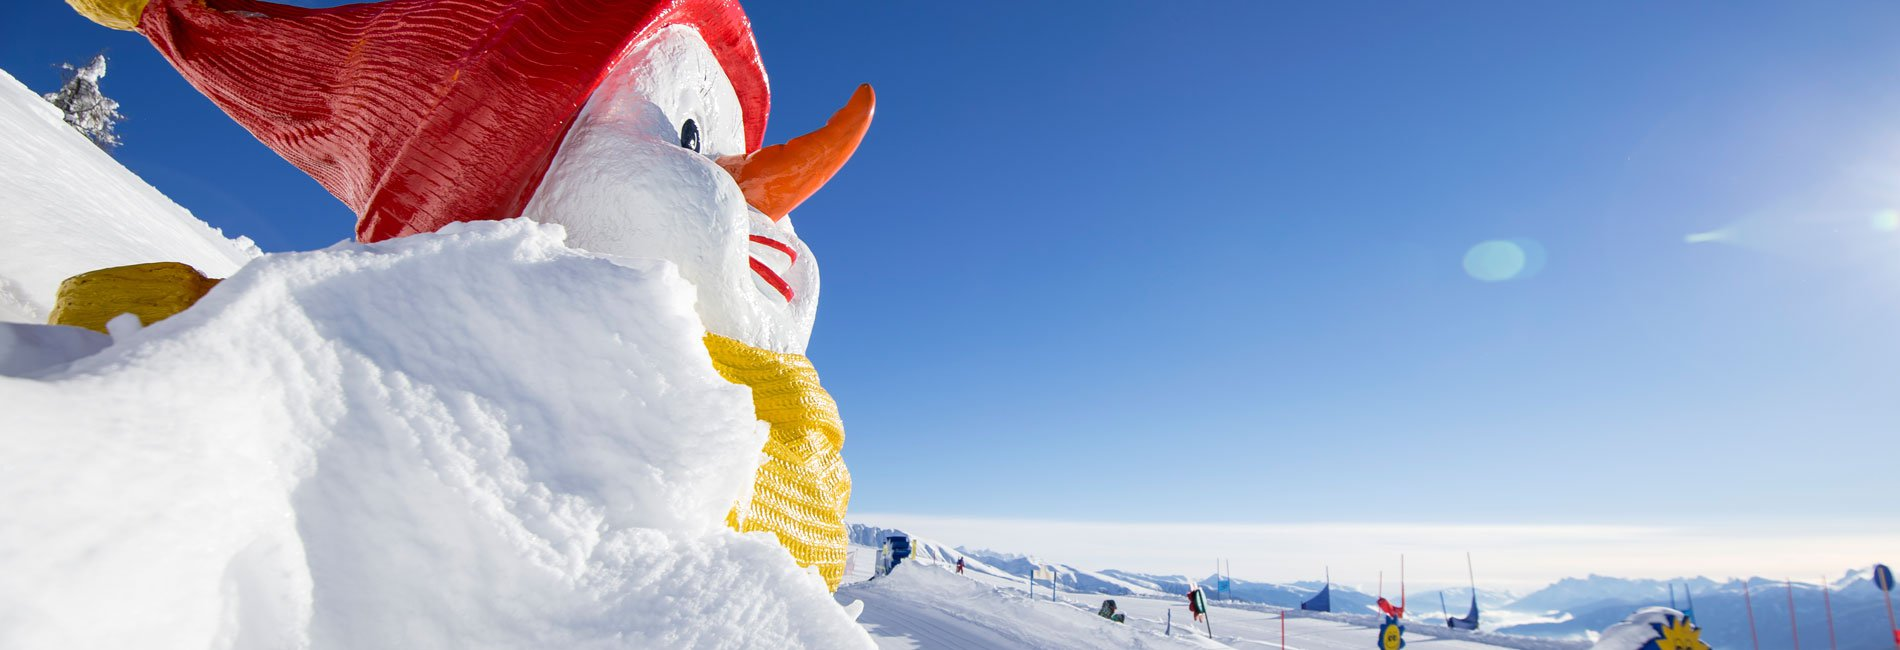 skiurlaub-meransen-27